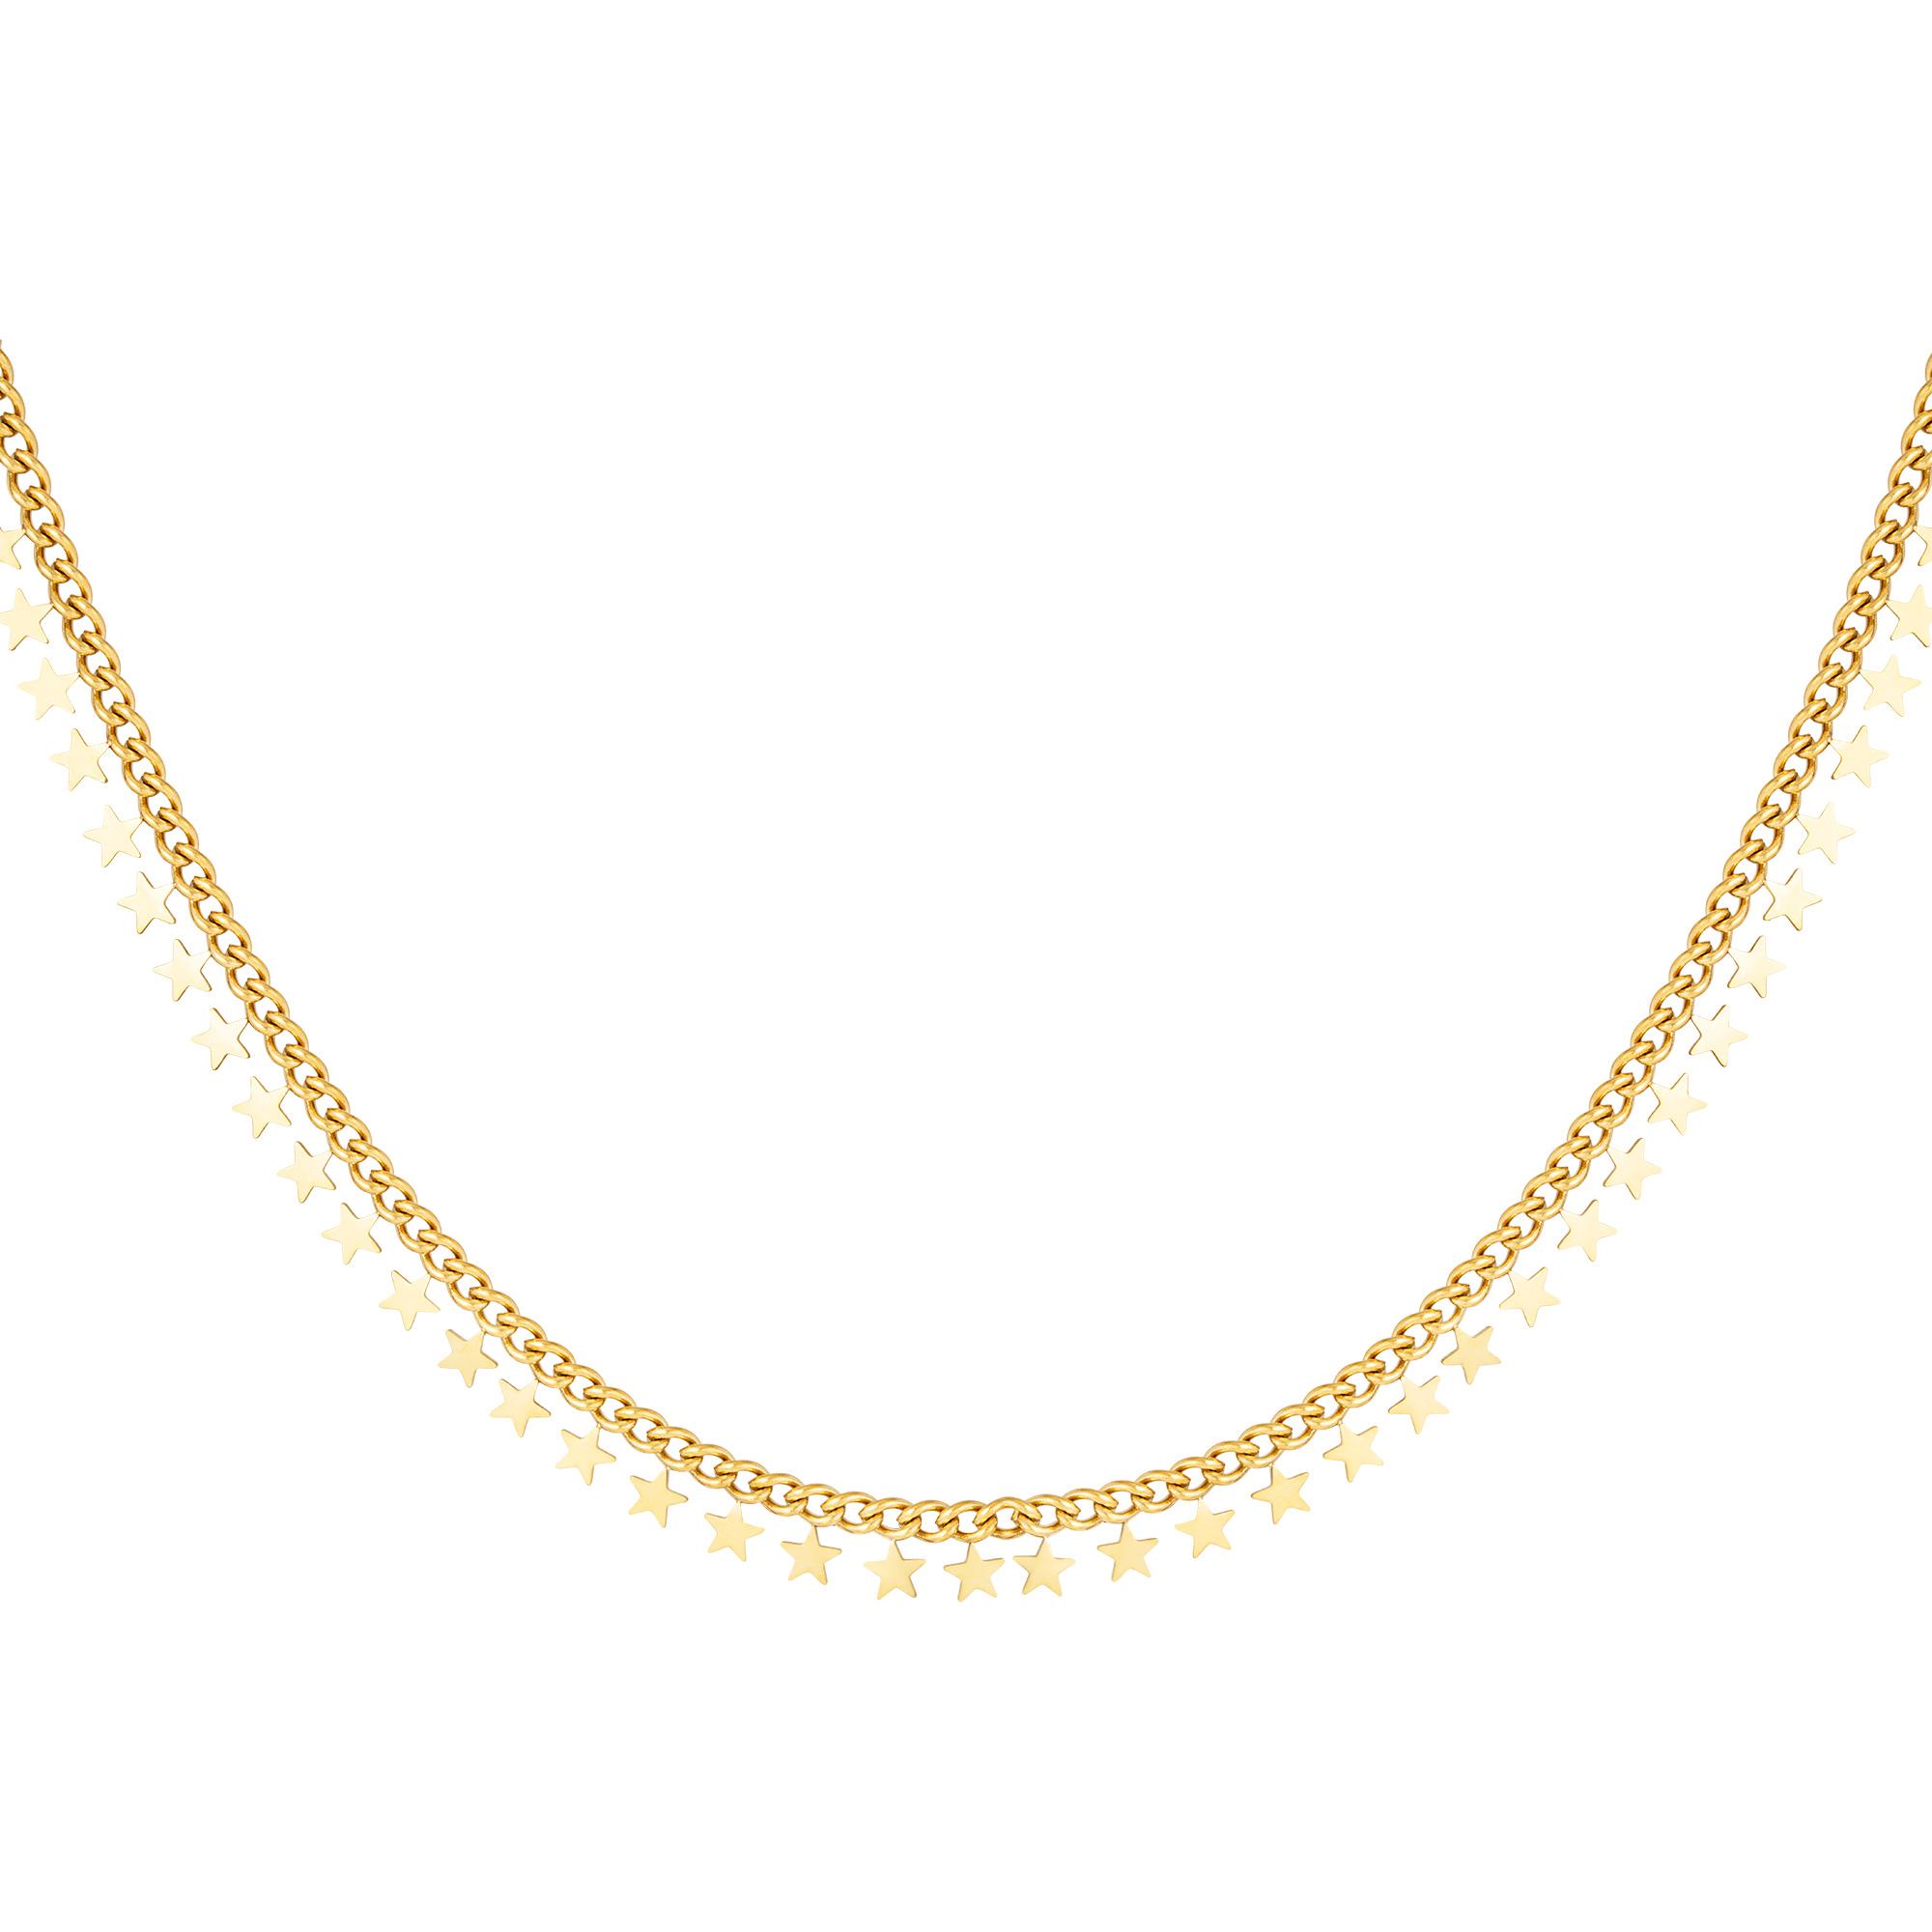 RVS ketting sterren necklace